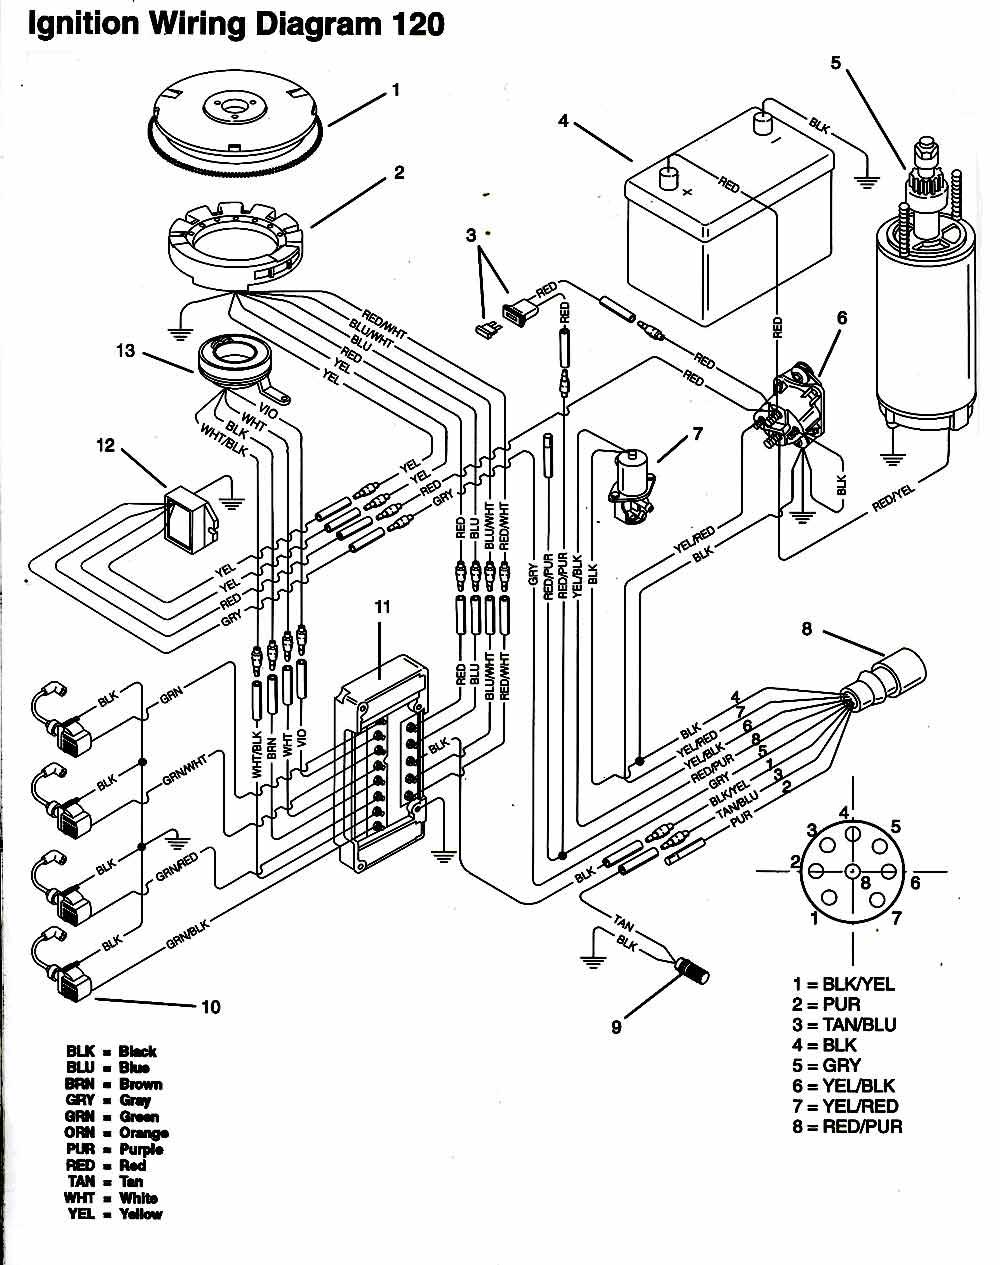 91 ford tempo manual